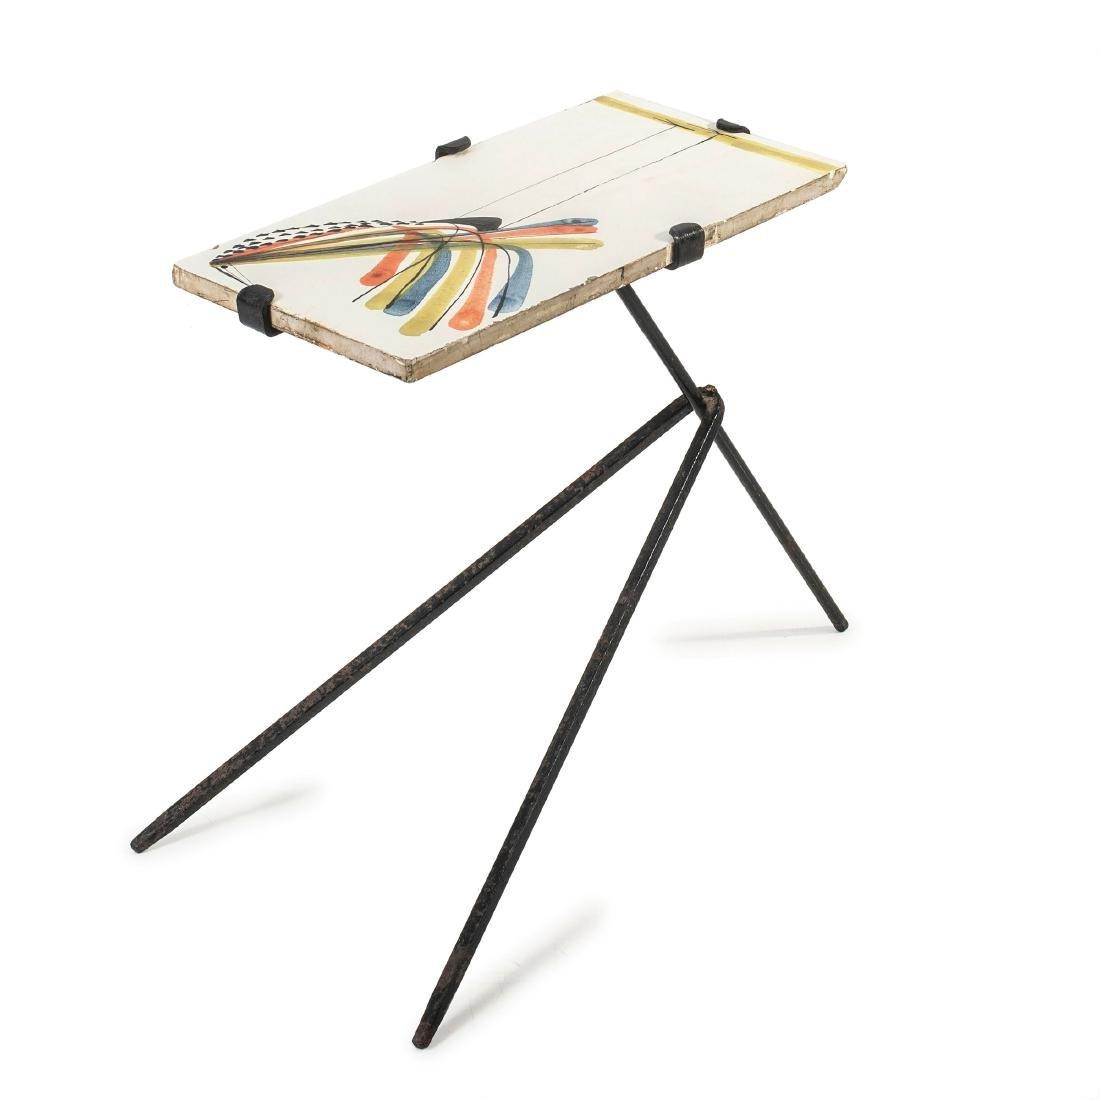 Small smokers' table, c. 1950 - 3